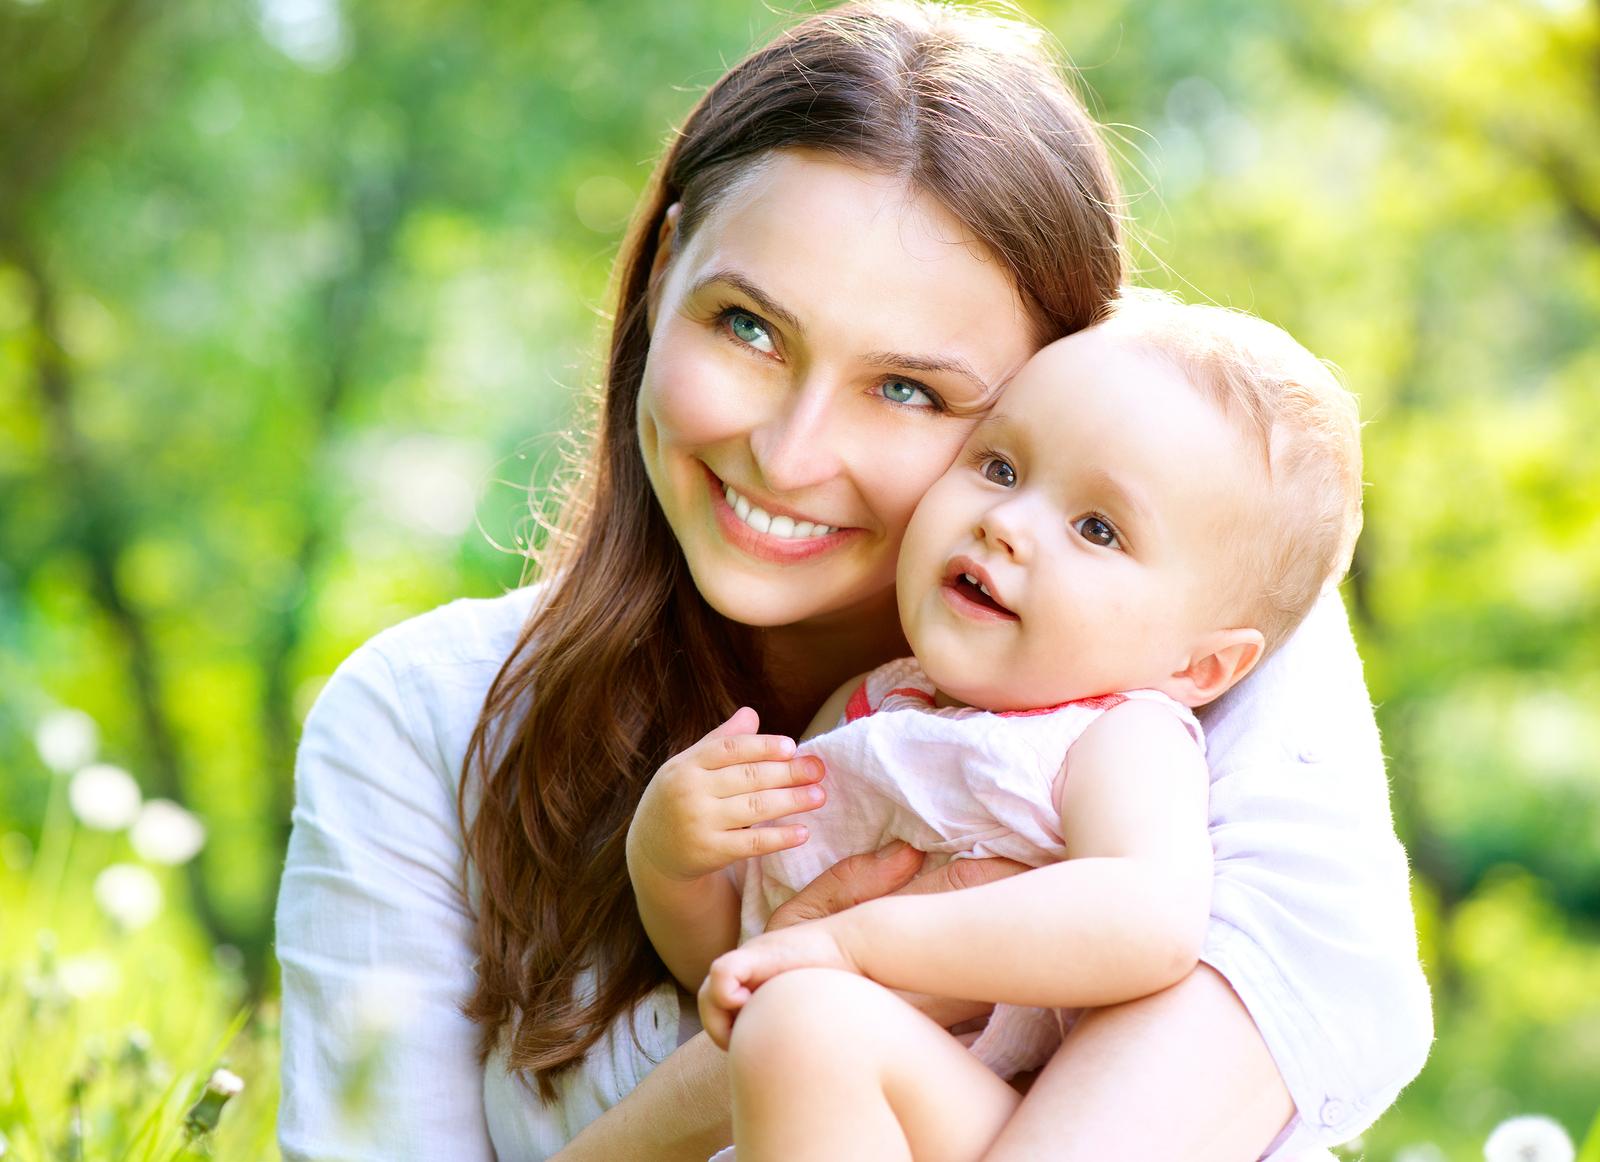 Картинки с изображением мамы и ребенка, картинки мчс открытка